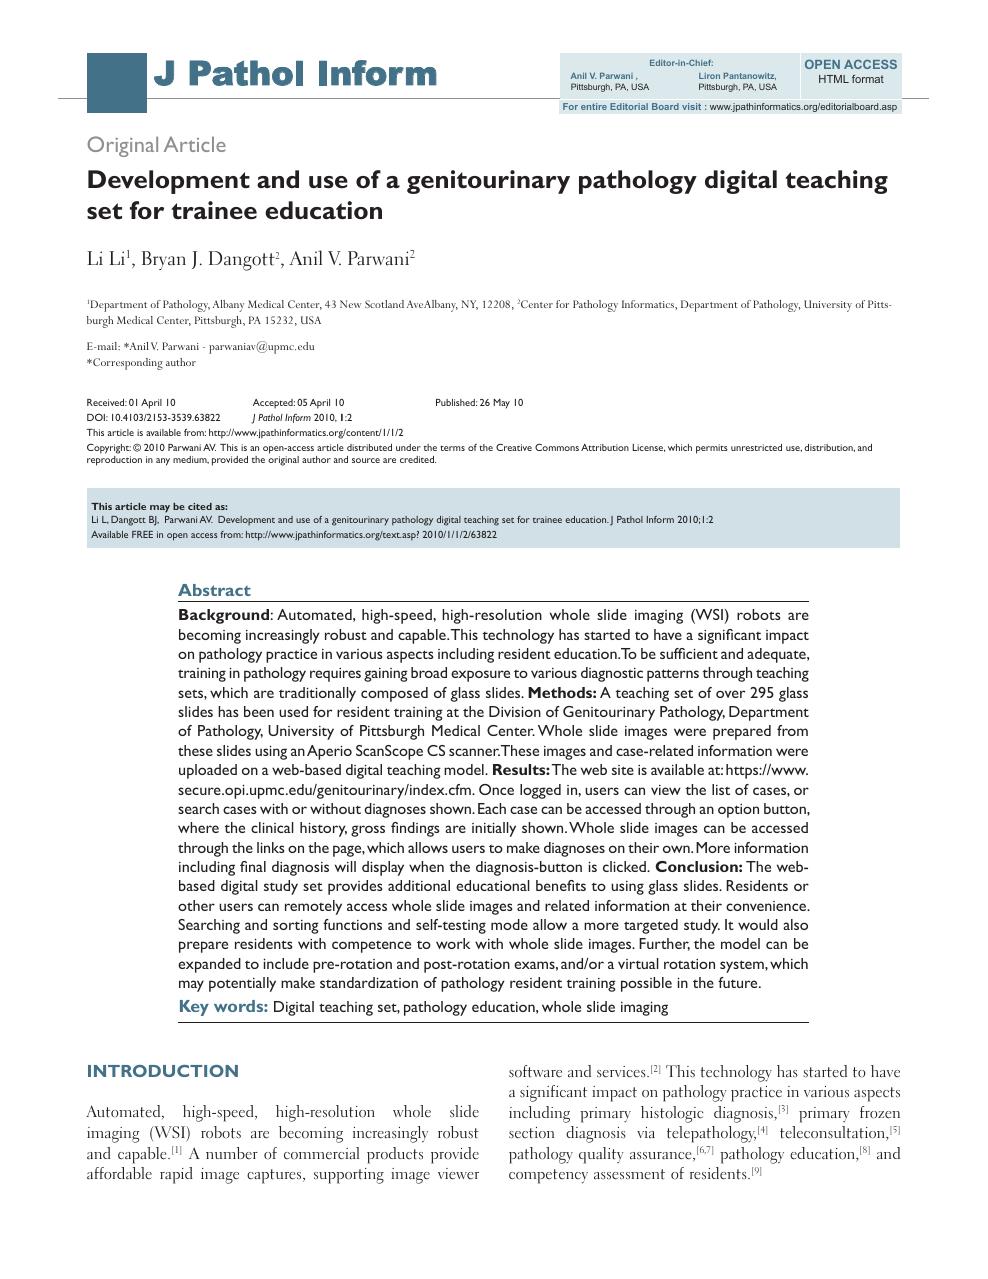 Development and use of a genitourinary pathology digital